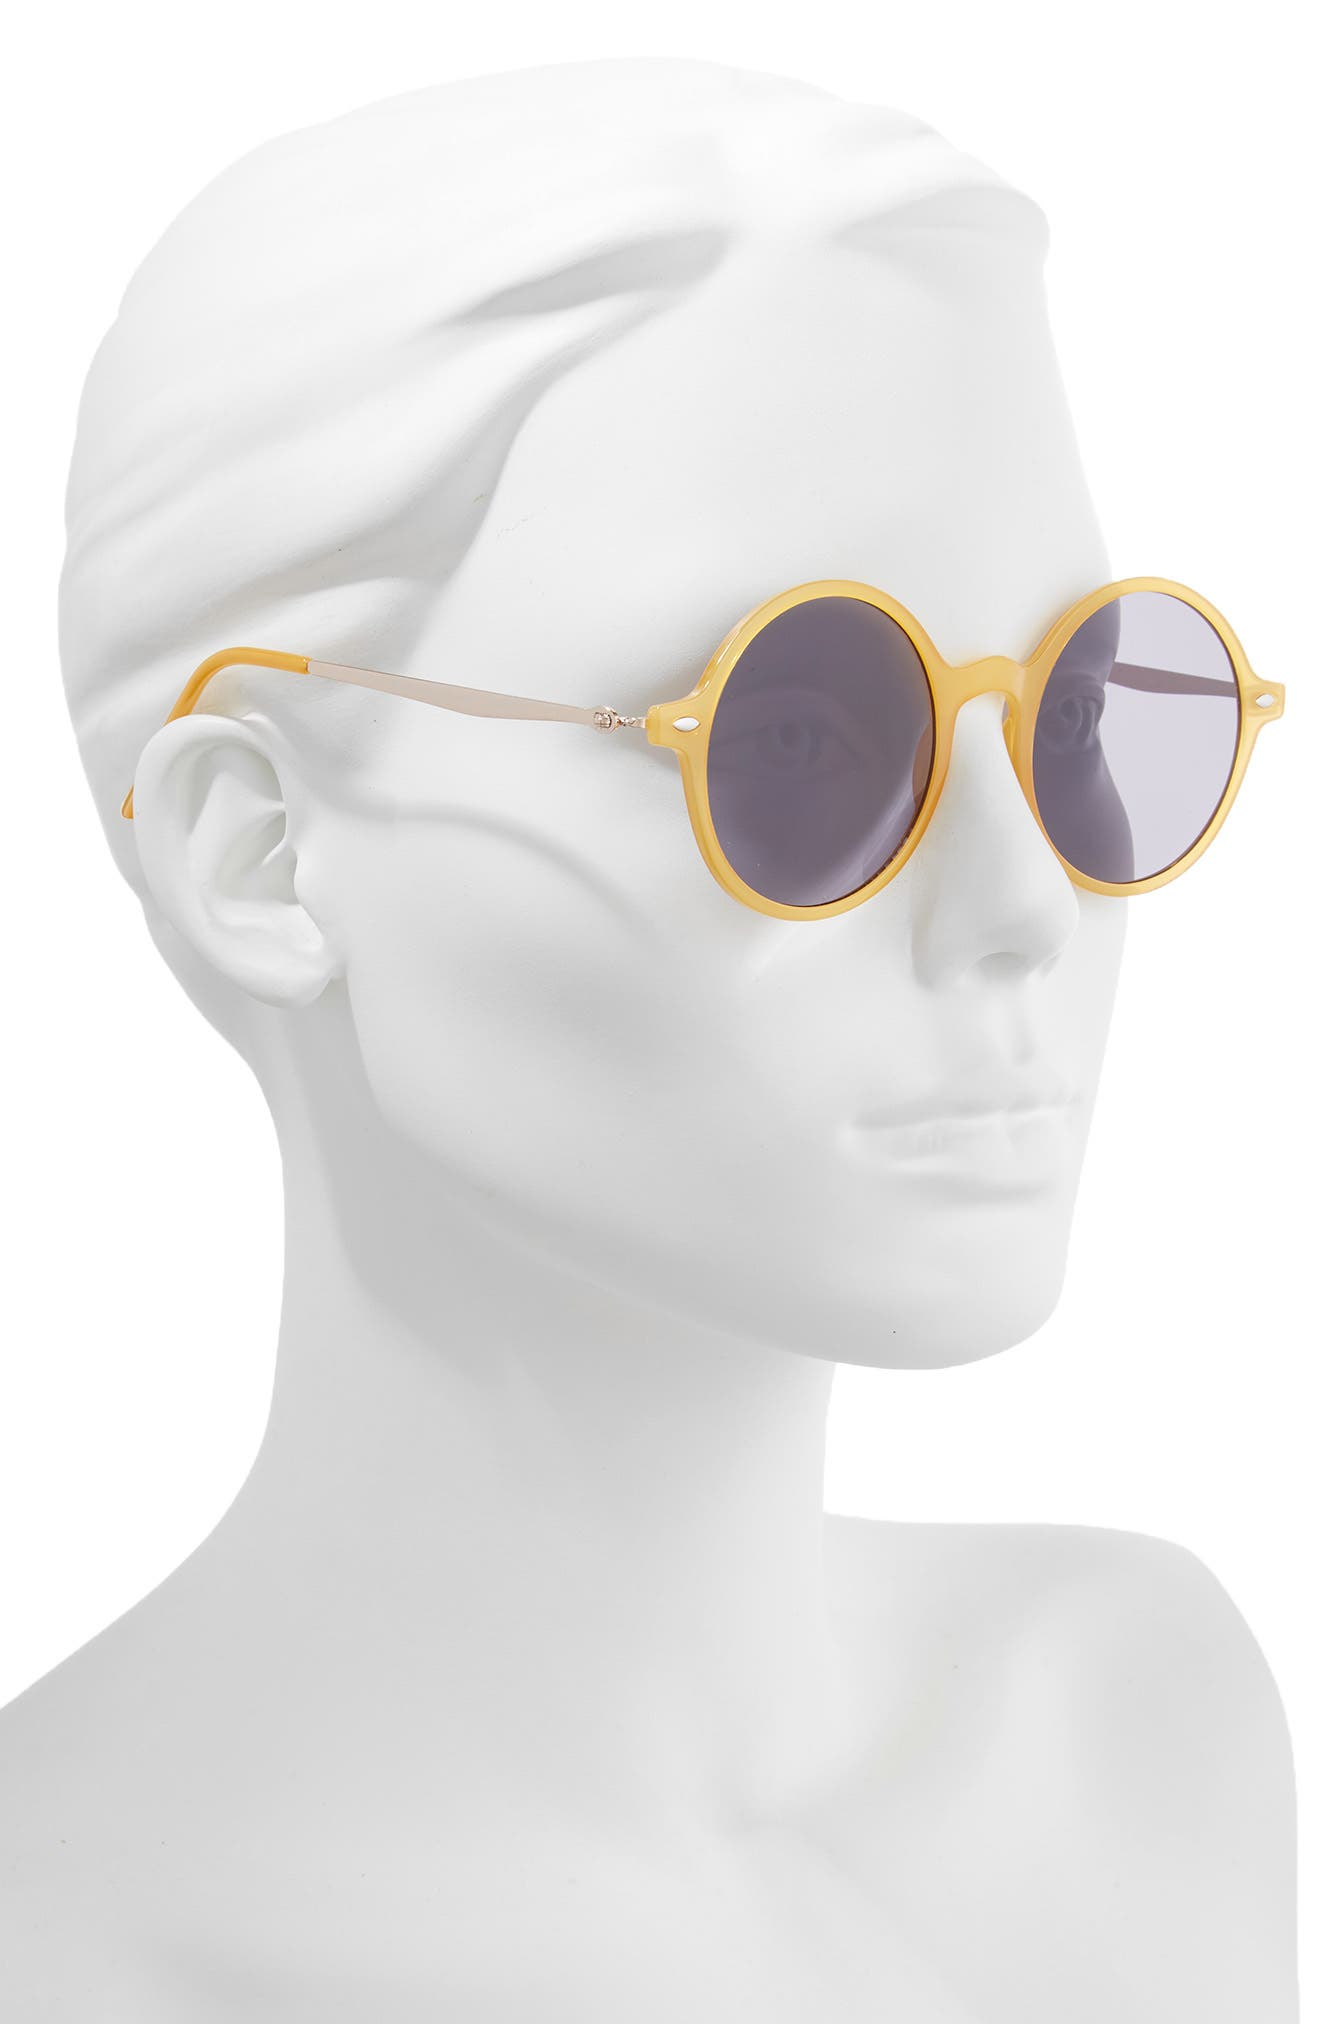 48mm Round Mixed Media Sunglasses,                             Alternate thumbnail 2, color,                             NAVY/ YELLOW